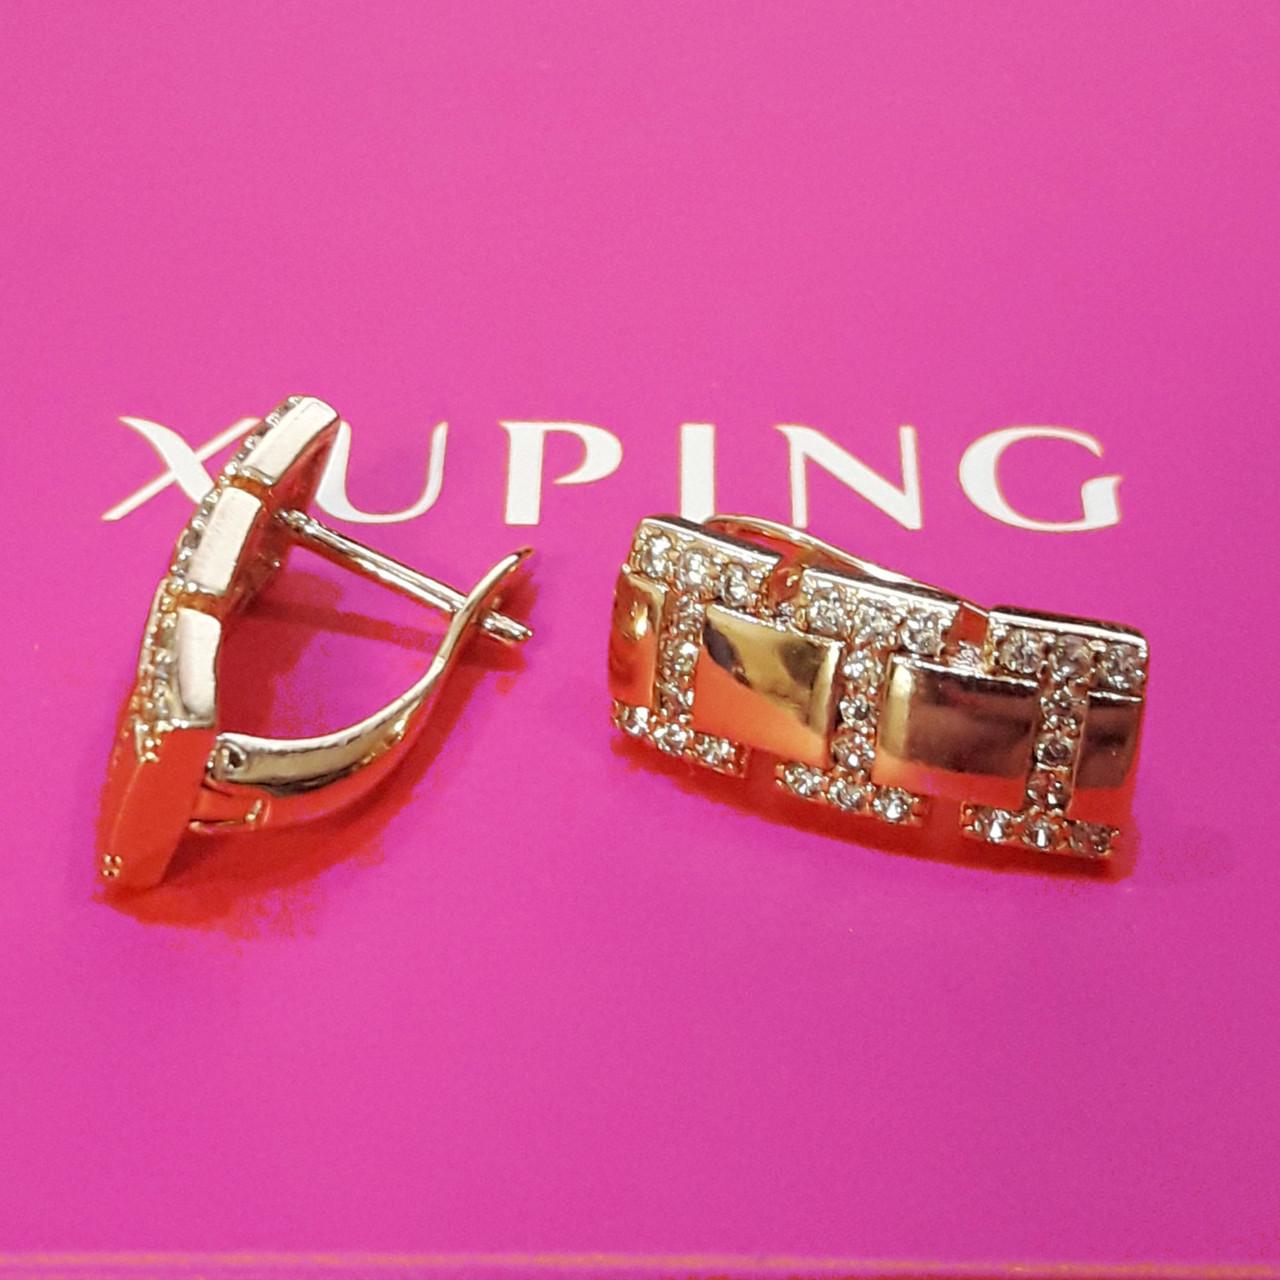 Серьги Xuping позолота 18К  длина 1.6см ширина 7мм с1103